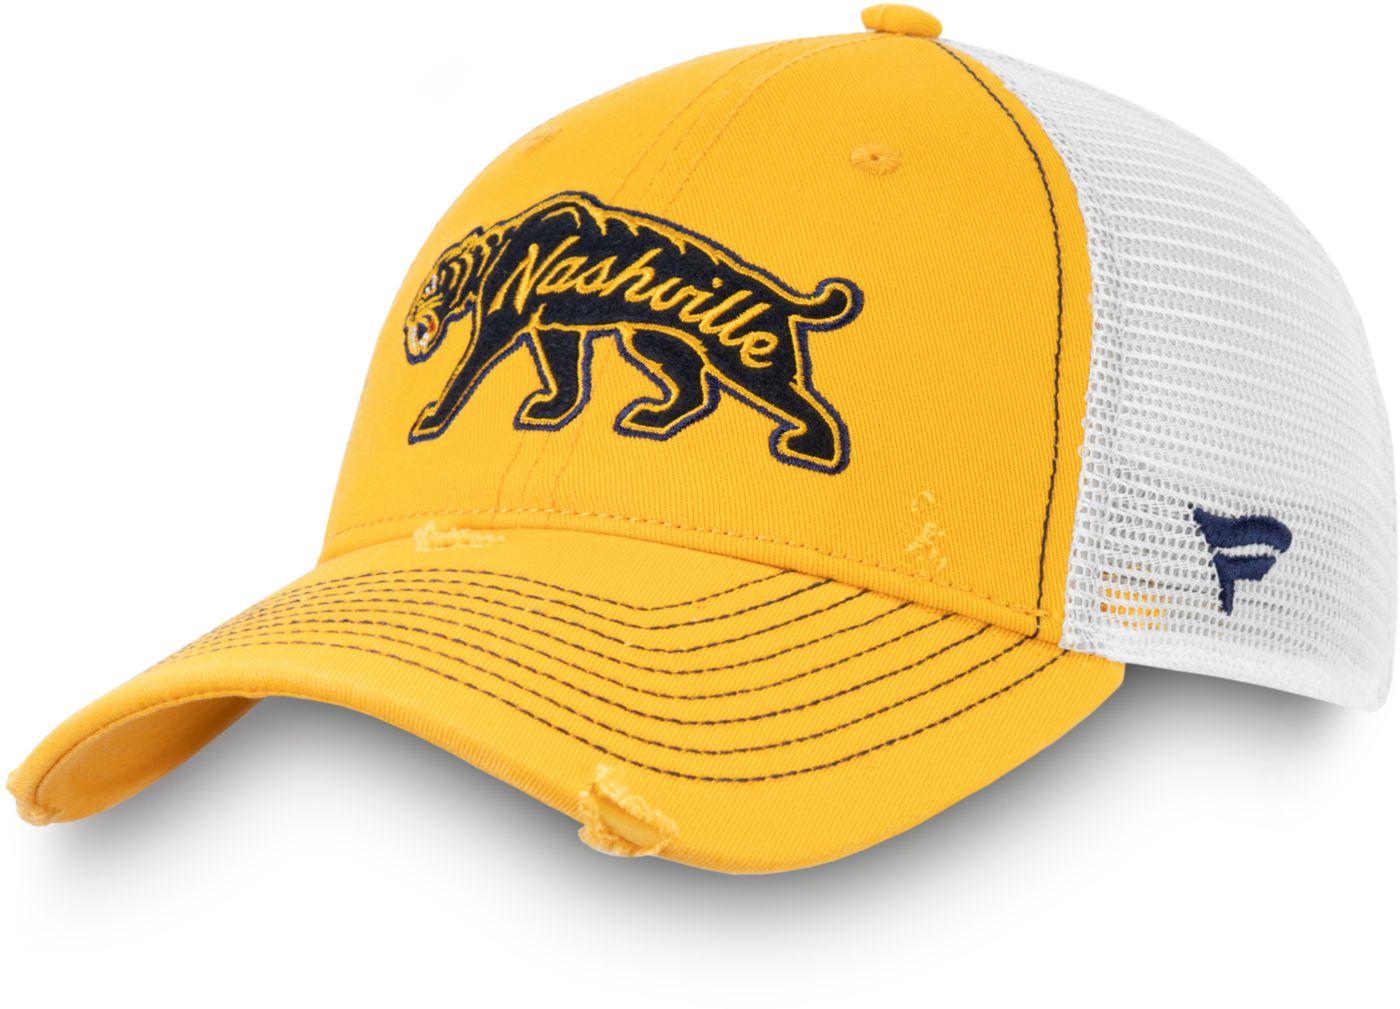 NHL Men's 2020 Winter Classic Nashville Predators Team Snapback Adjustable Hat